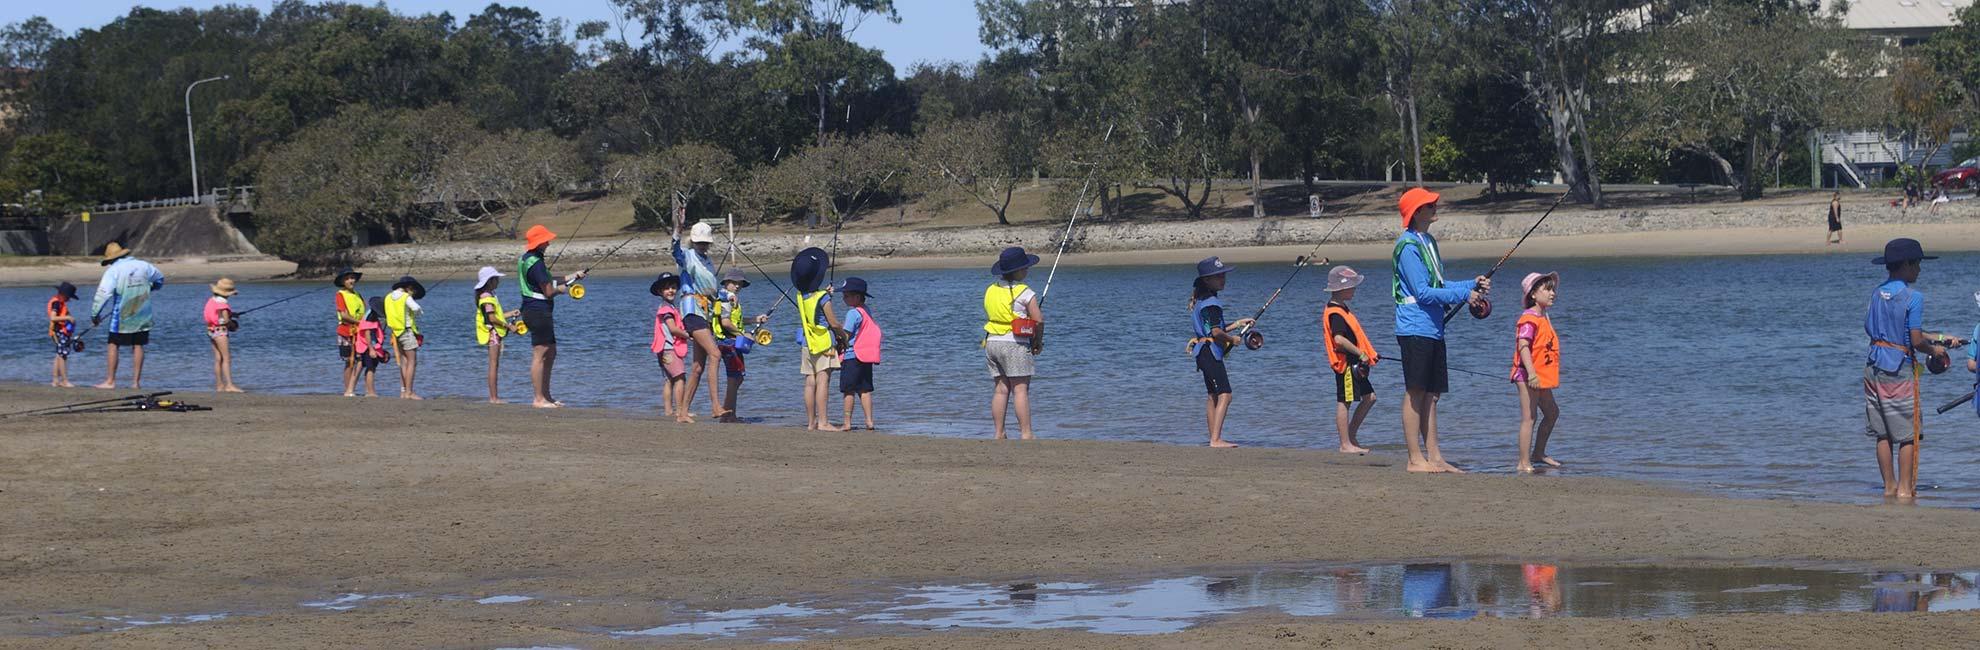 2 Bent Rods – Fishing Schools Brisbane | Learn To Fish